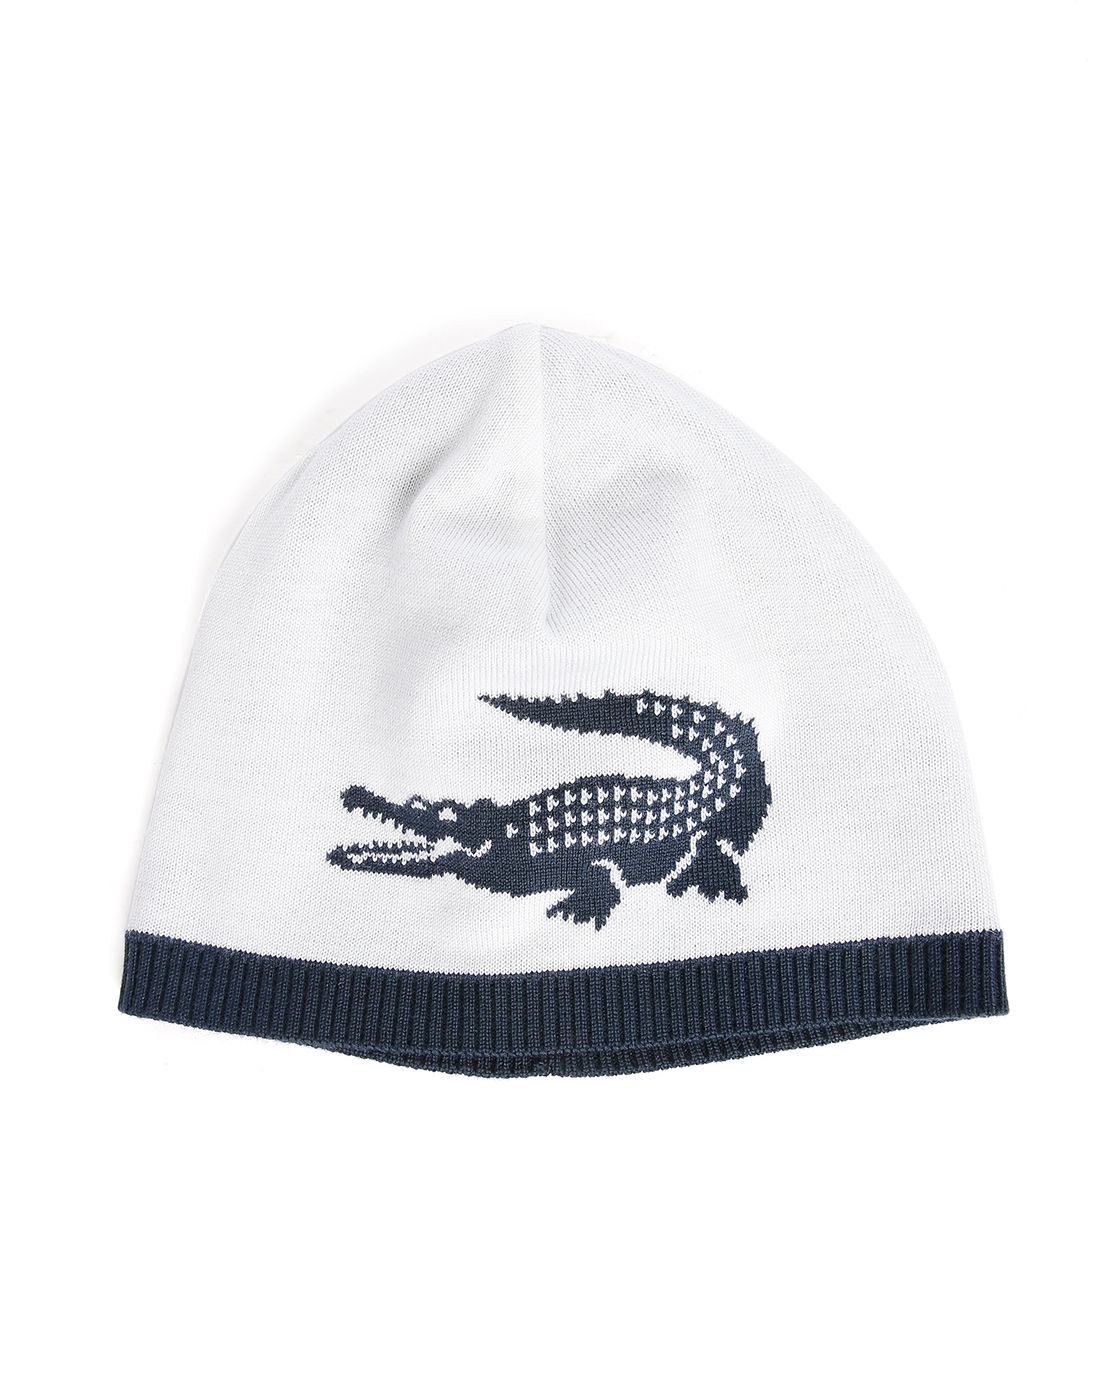 lacoste navy beige reversible hat with crocodile logo in